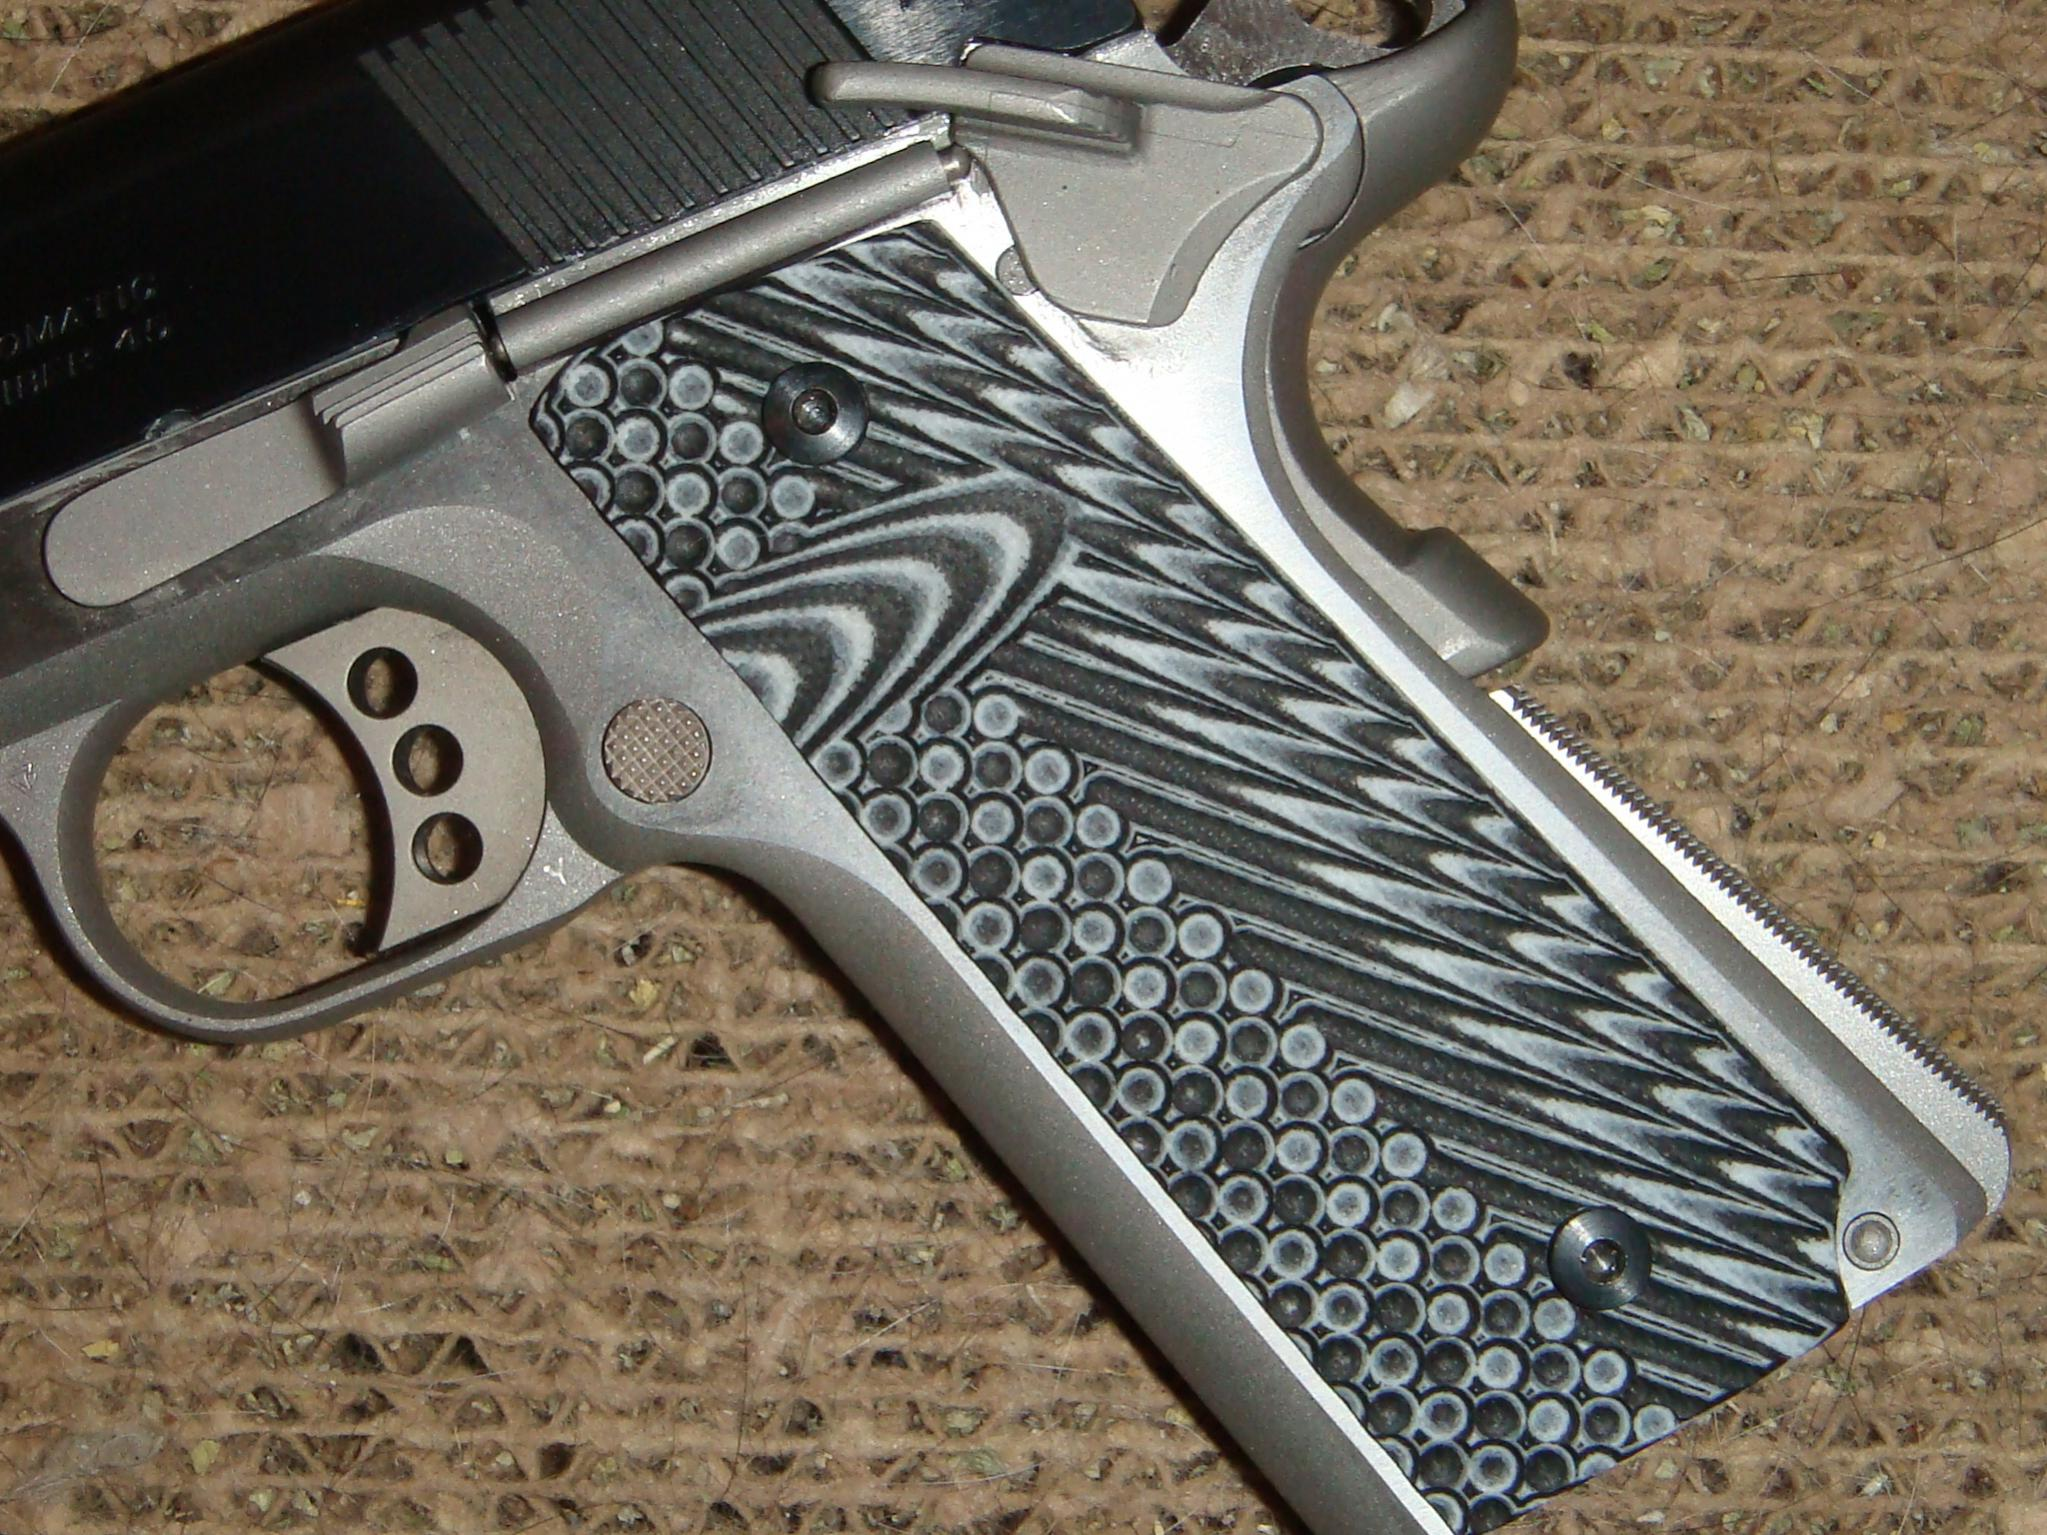 VZ Grips on the Dan Wesson CCO-dsc00771.jpg